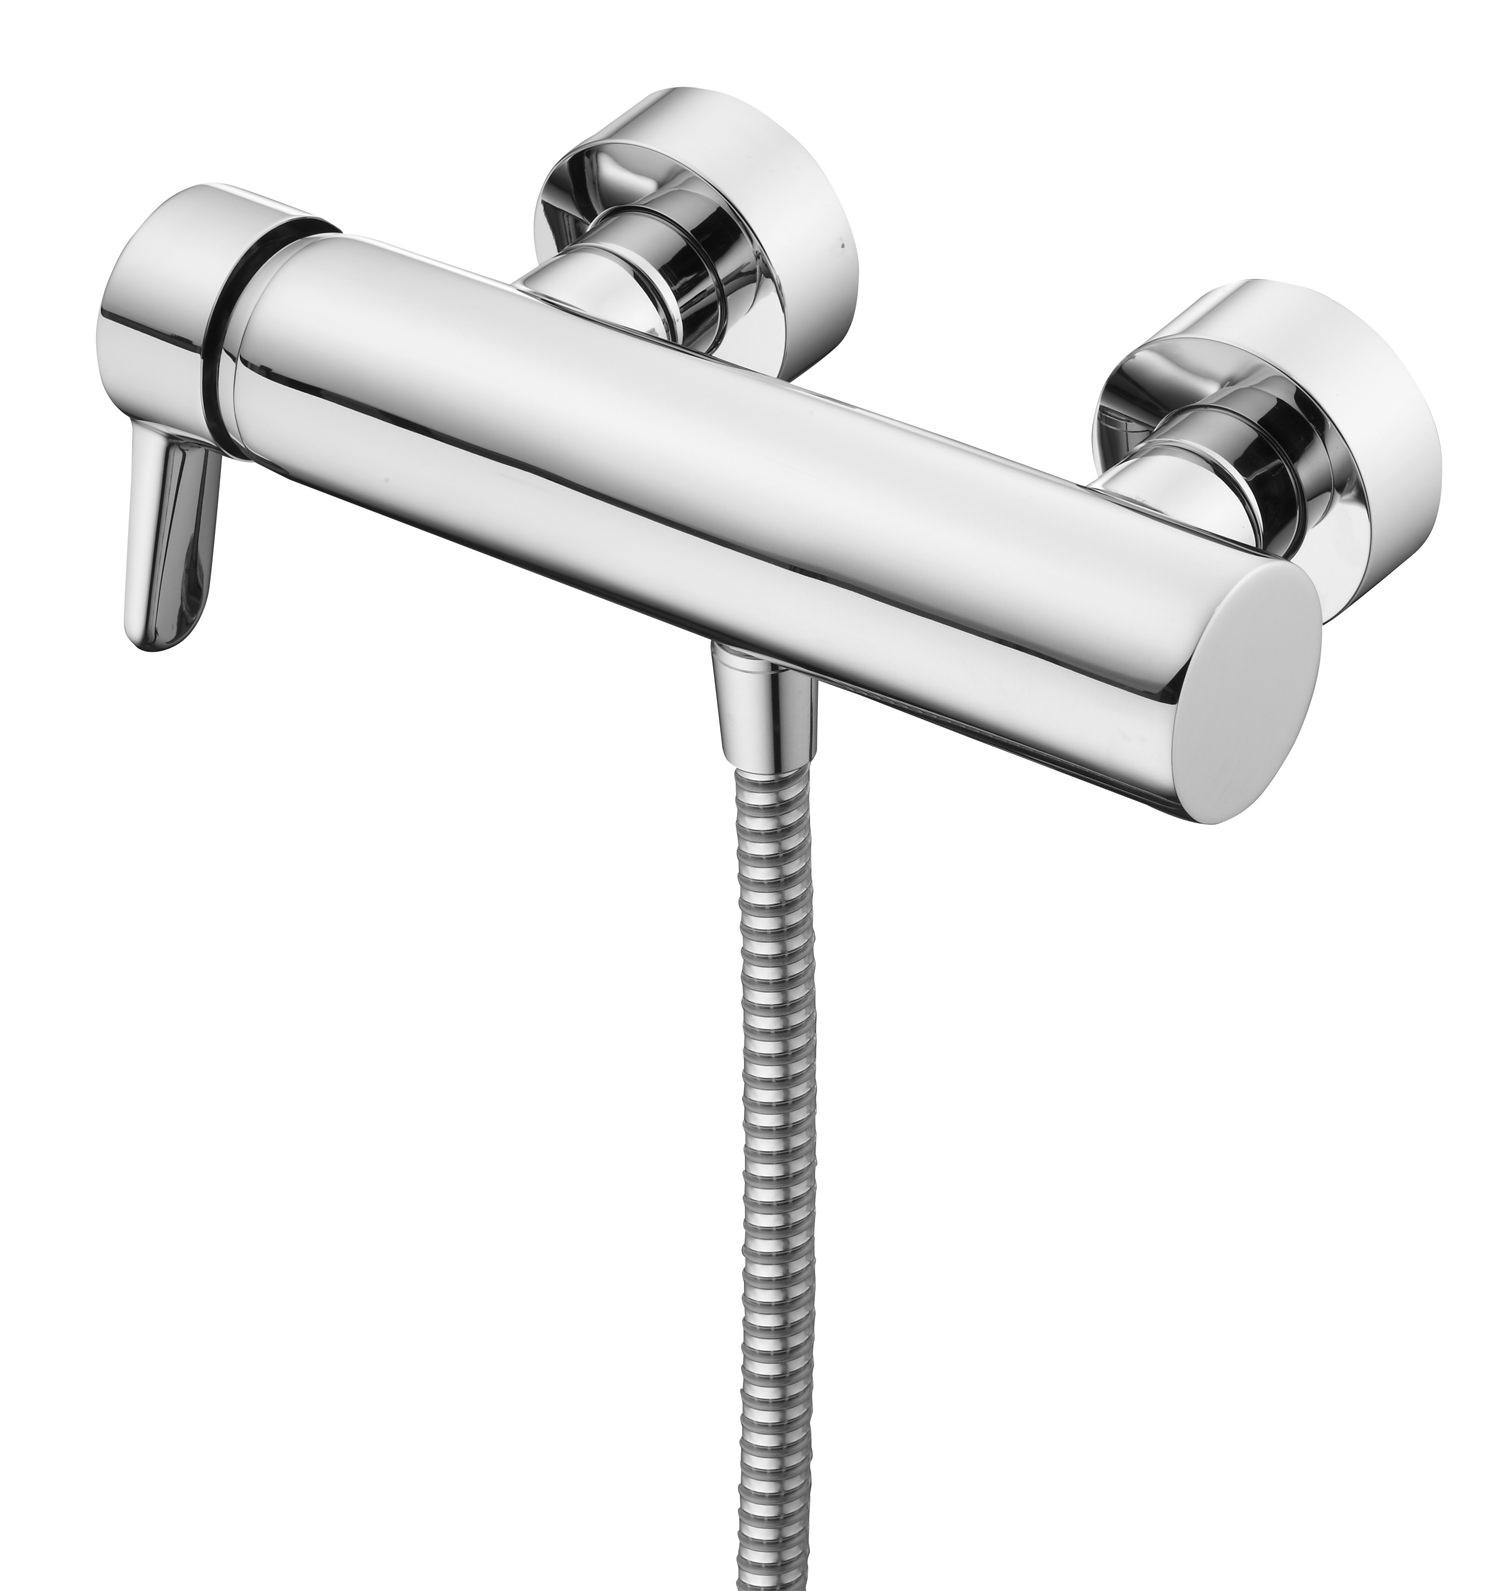 ideal standard concept blue single lever bath shower mixer. Black Bedroom Furniture Sets. Home Design Ideas